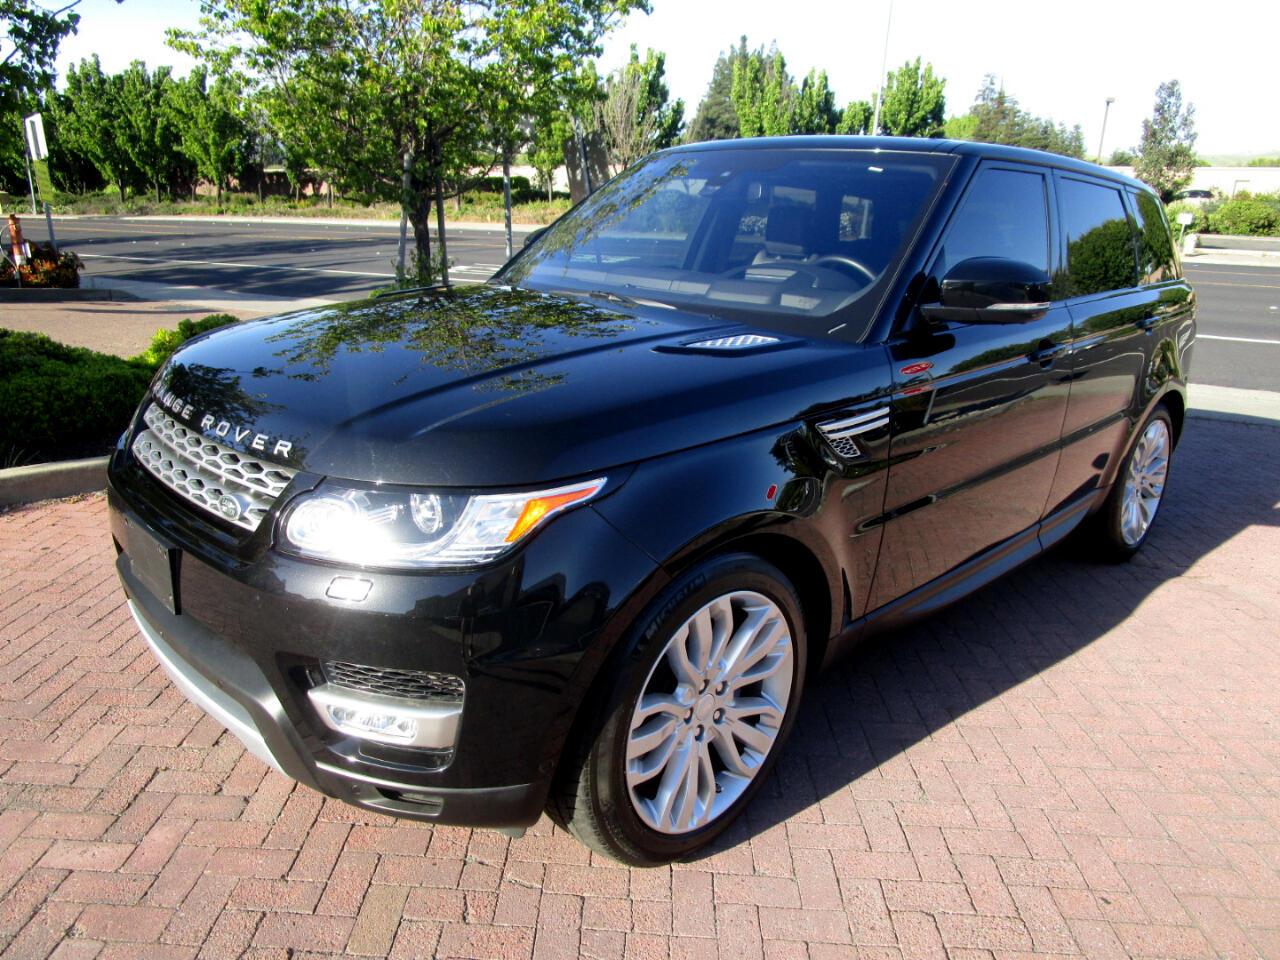 2016 Land Rover Range Rover Sport SUPERCHARGED V6*HEAT/AC SEATS*REAR HEAT SEATS*PANO